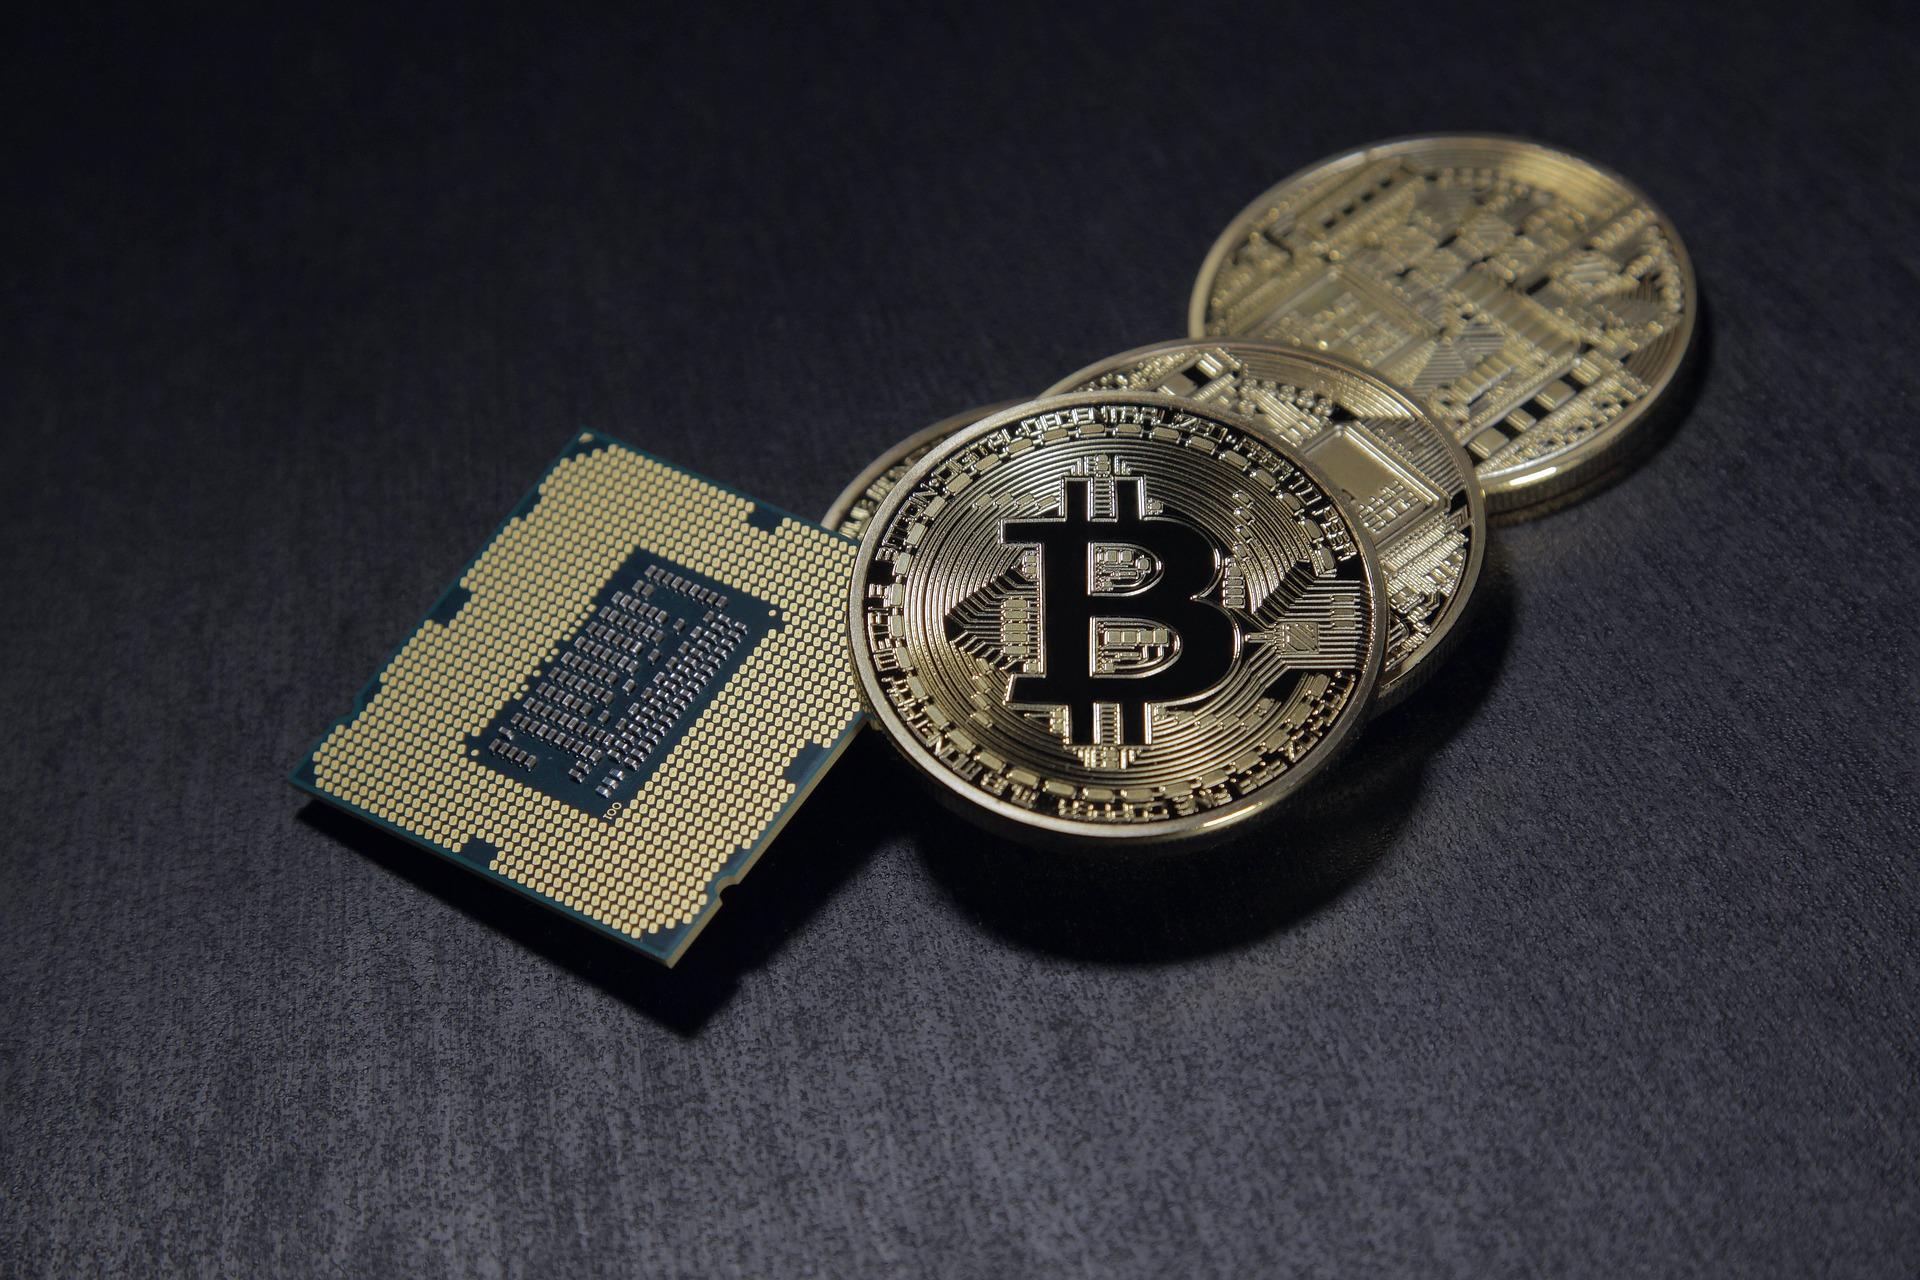 Cryptocurrency News Today: CoinList, Verge (XVG), Cobinhood